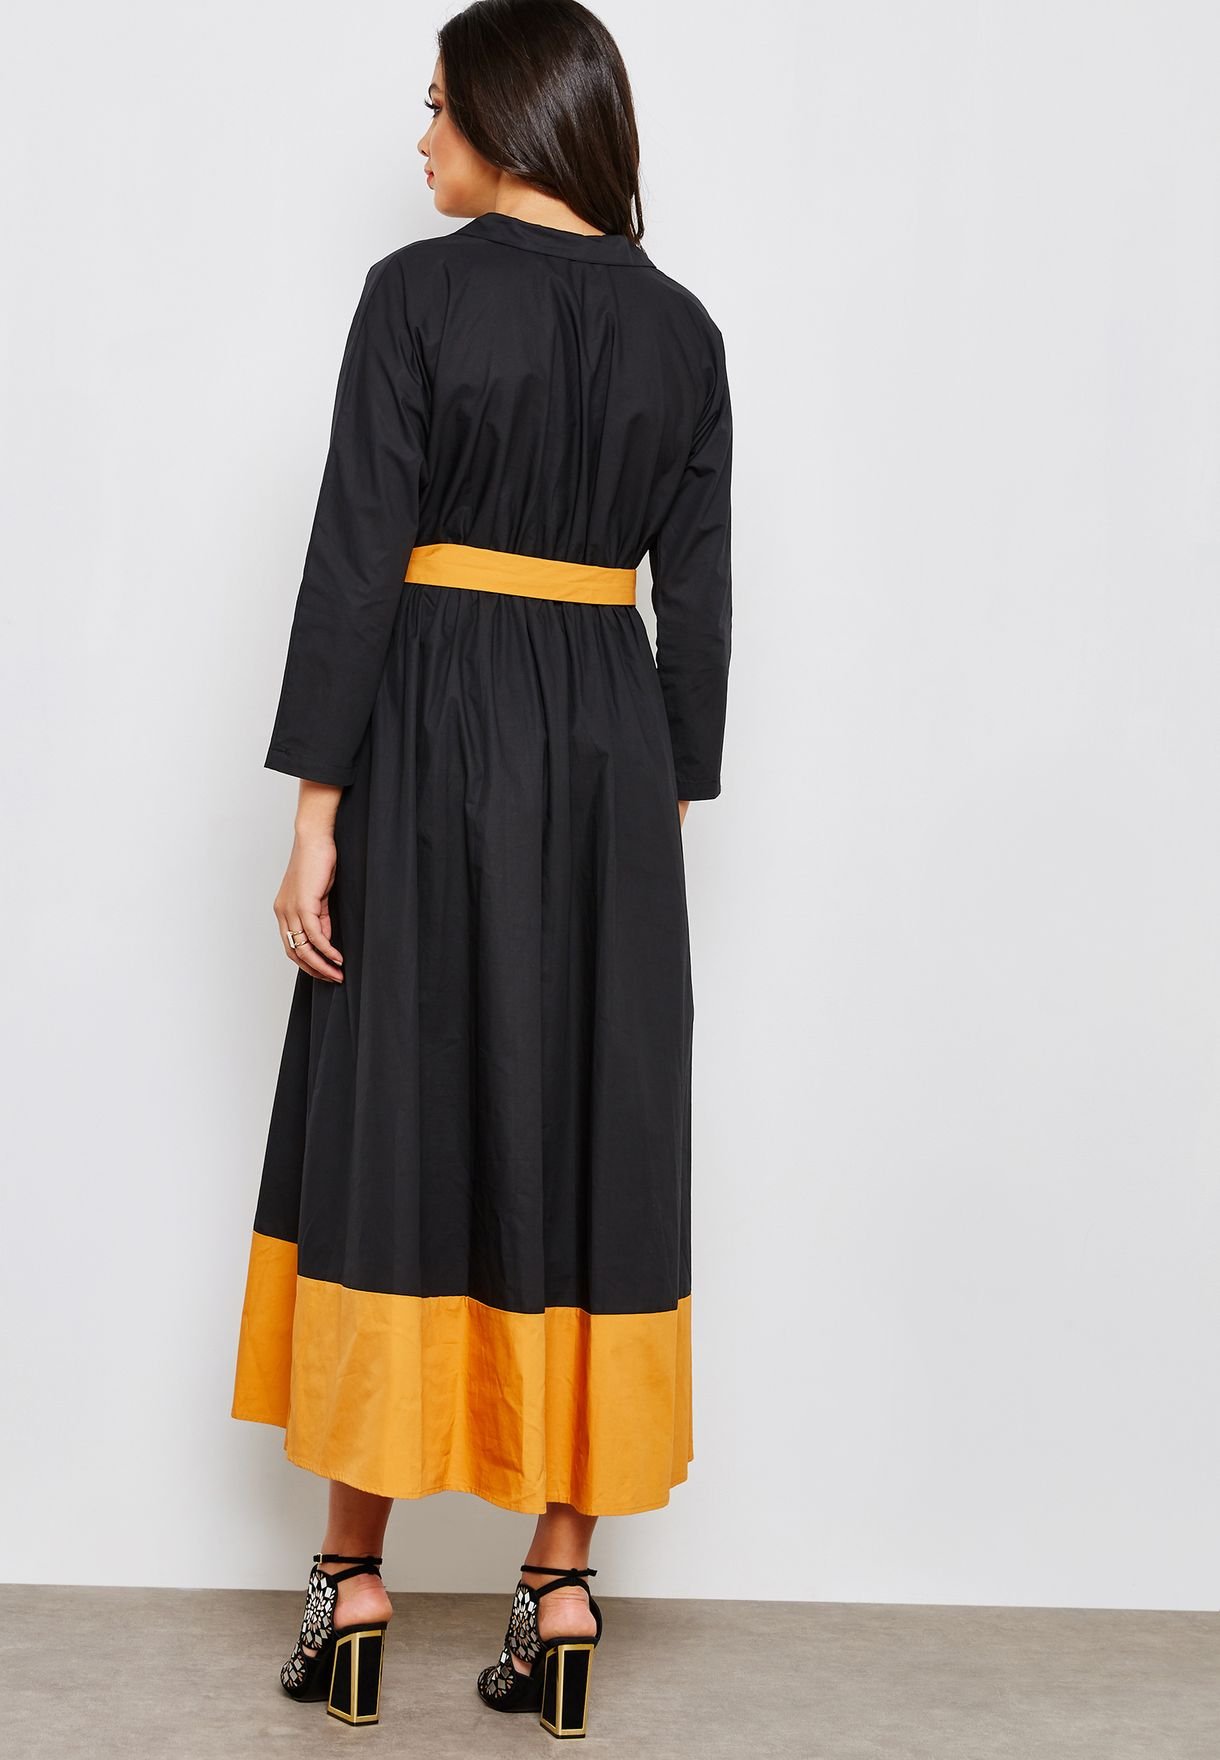 Pocket Detail Tie Waist Dress